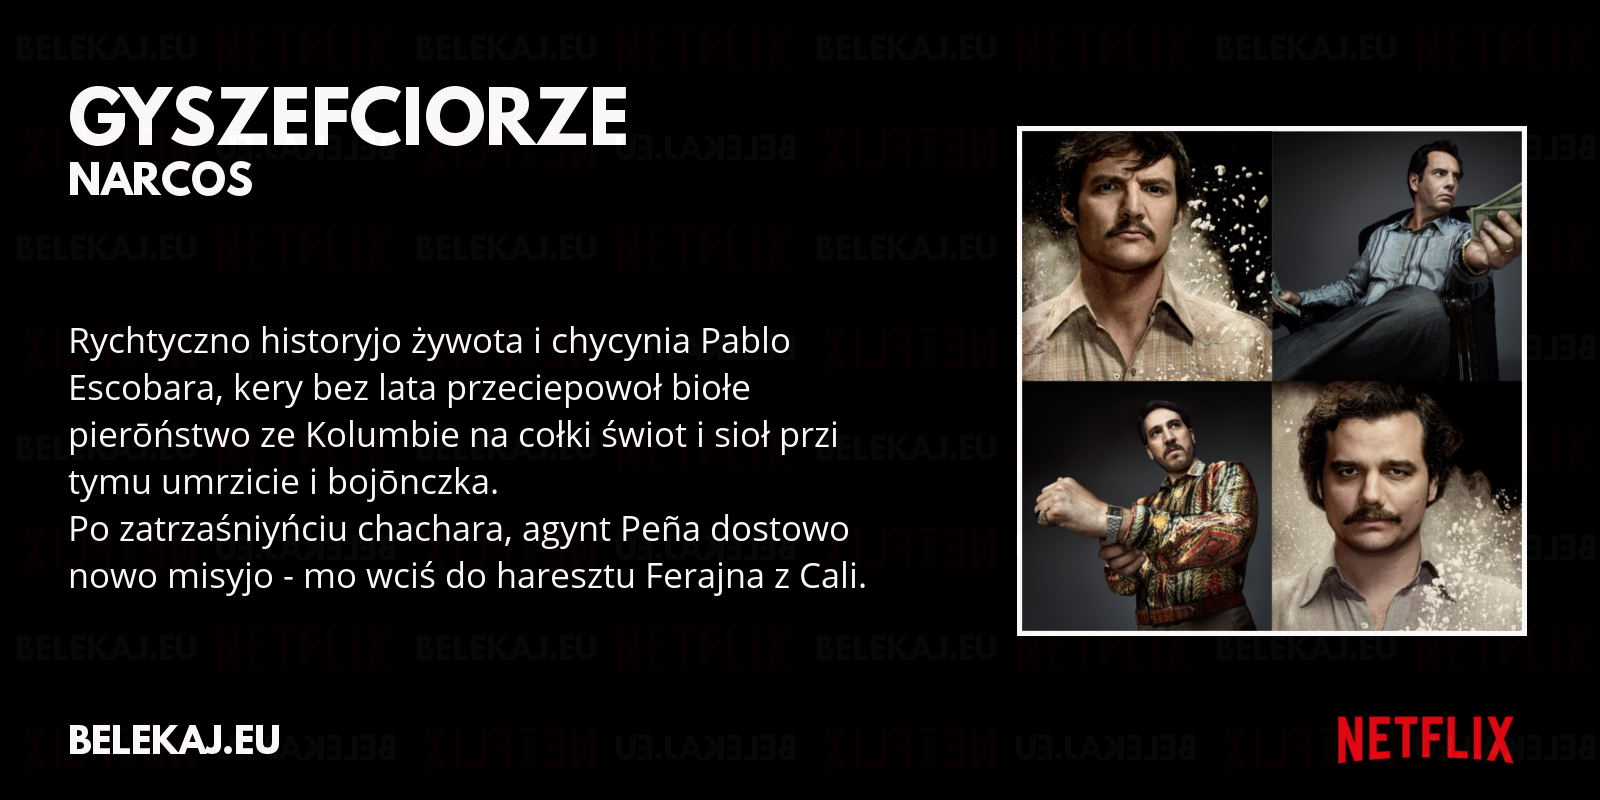 Narcos - Netflix po śląsku